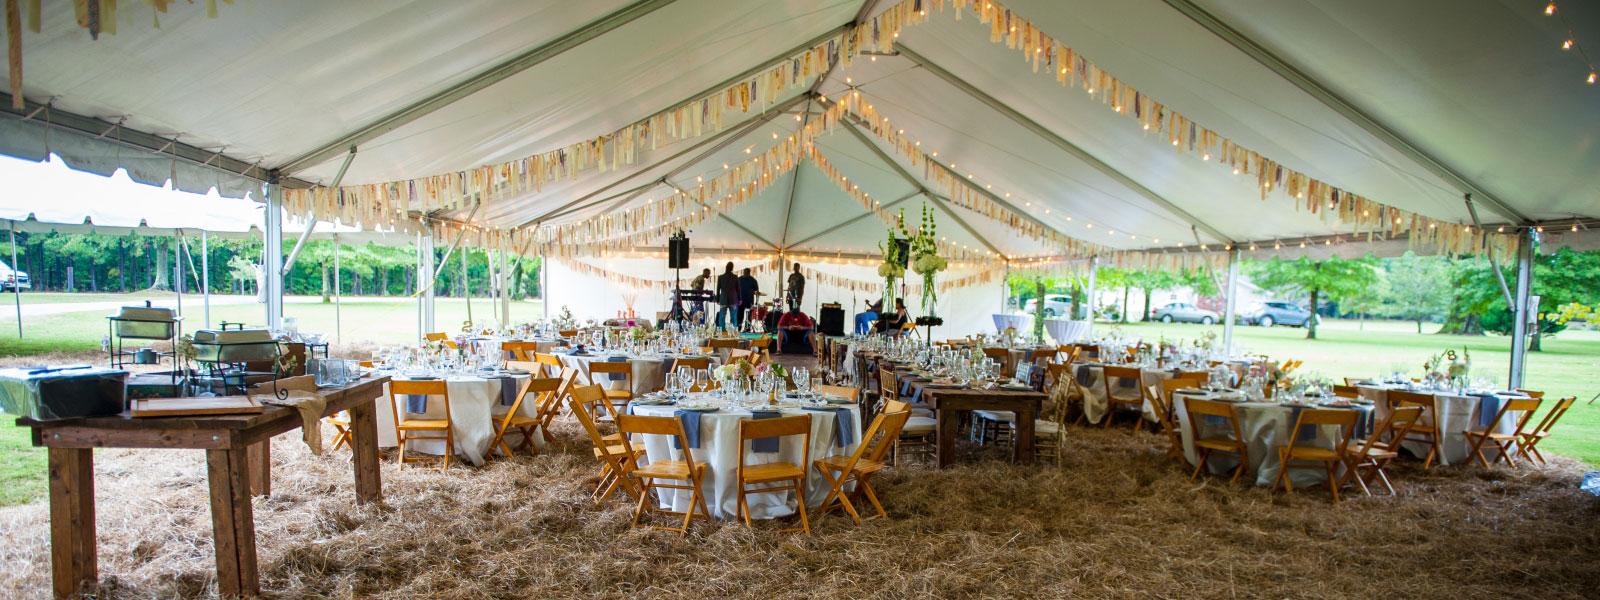 magnoliarental wedding decoration rentals Party rentals in North Mississippi